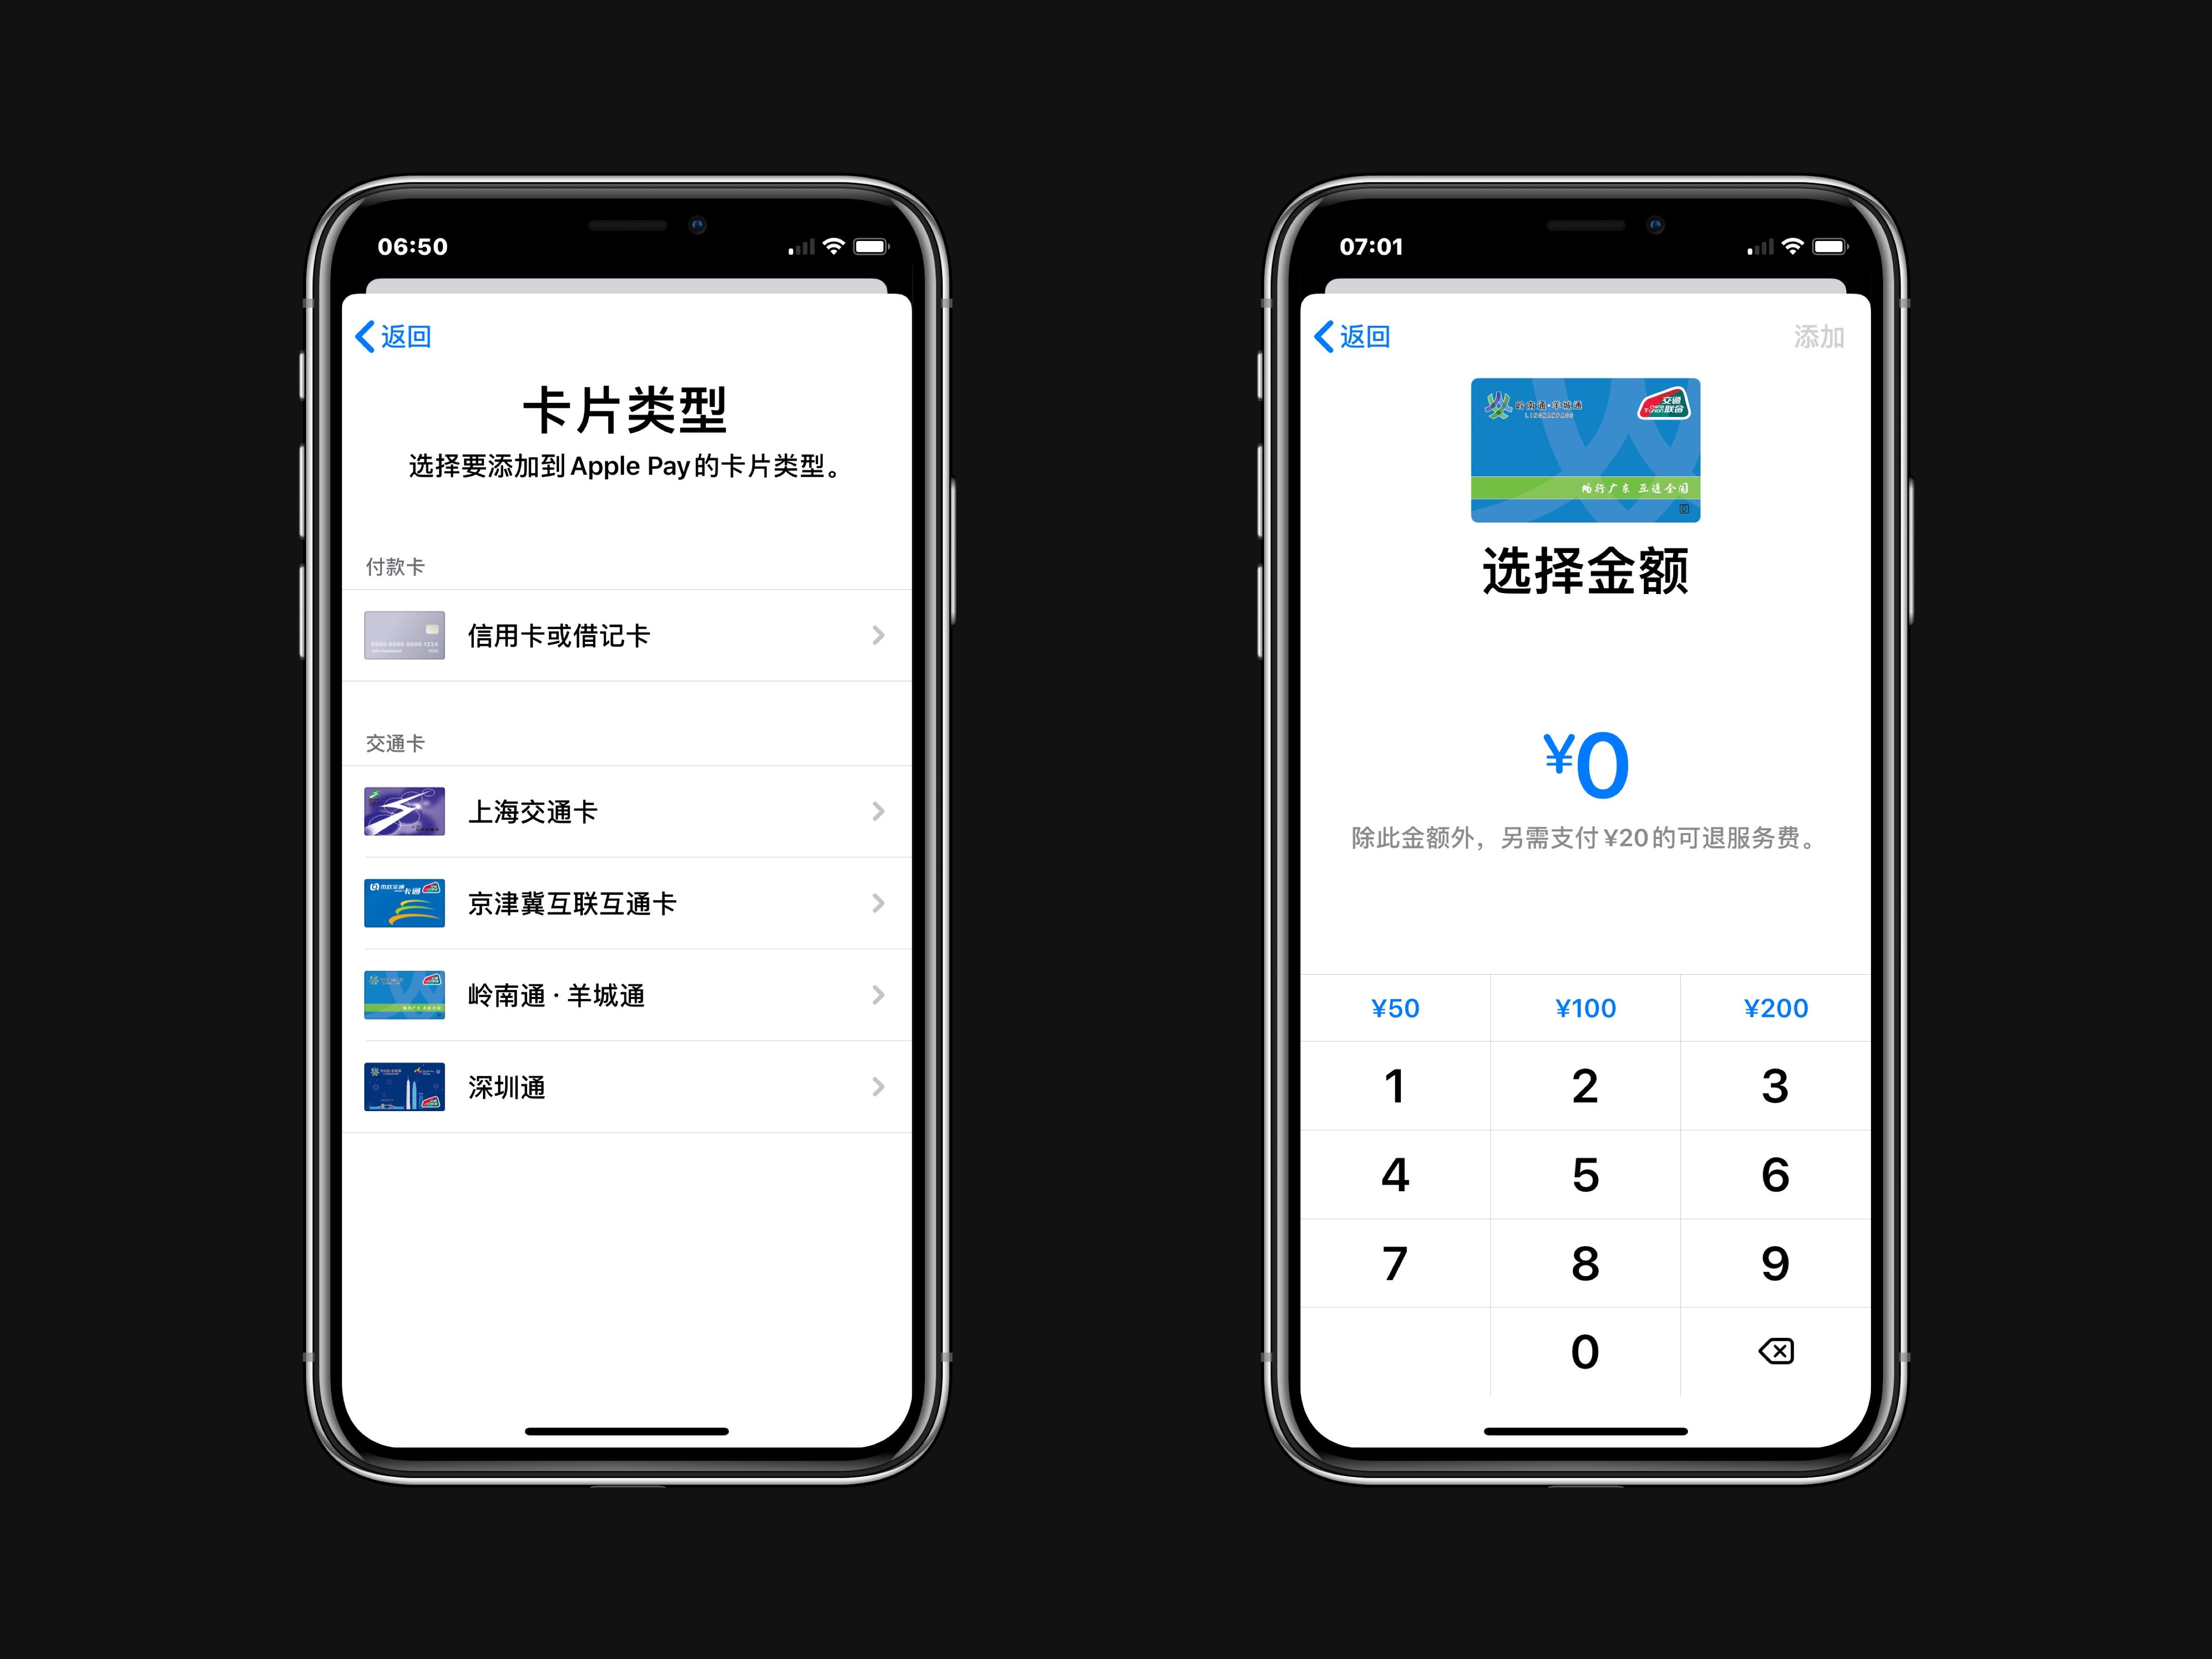 Apple Pay 公交卡正式支持岭南通·羊城通